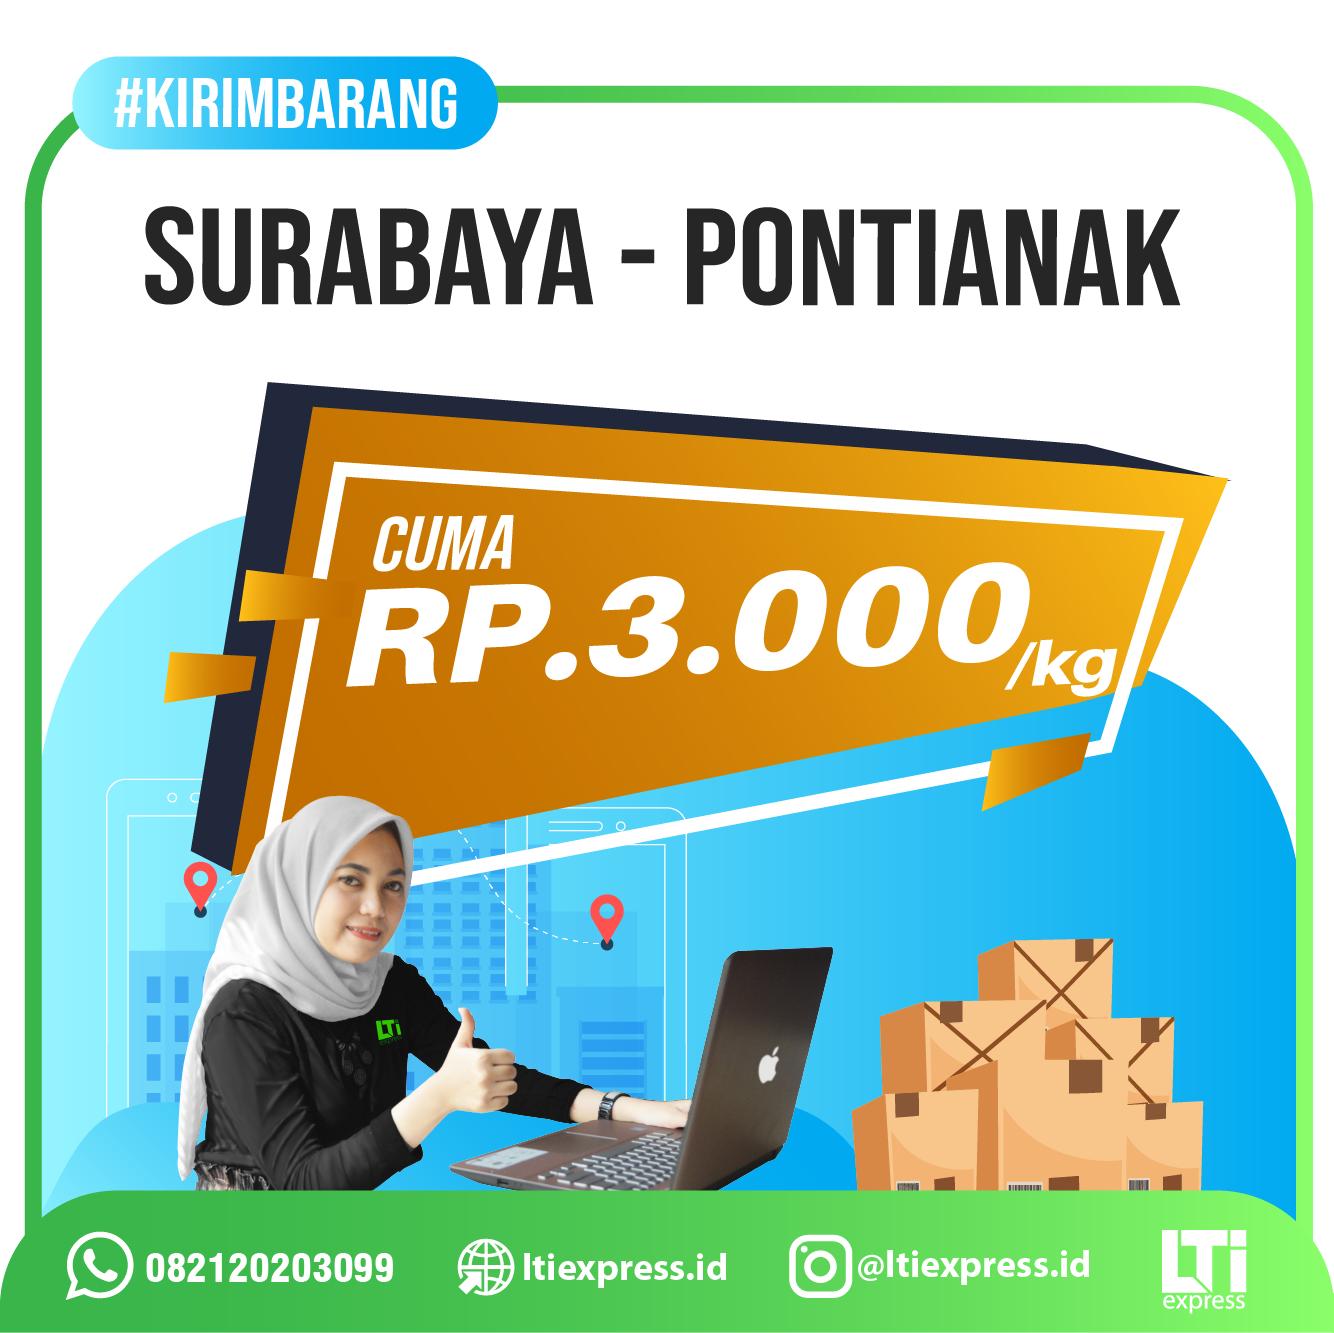 Ekspedisi Surabaya Pontianak murah